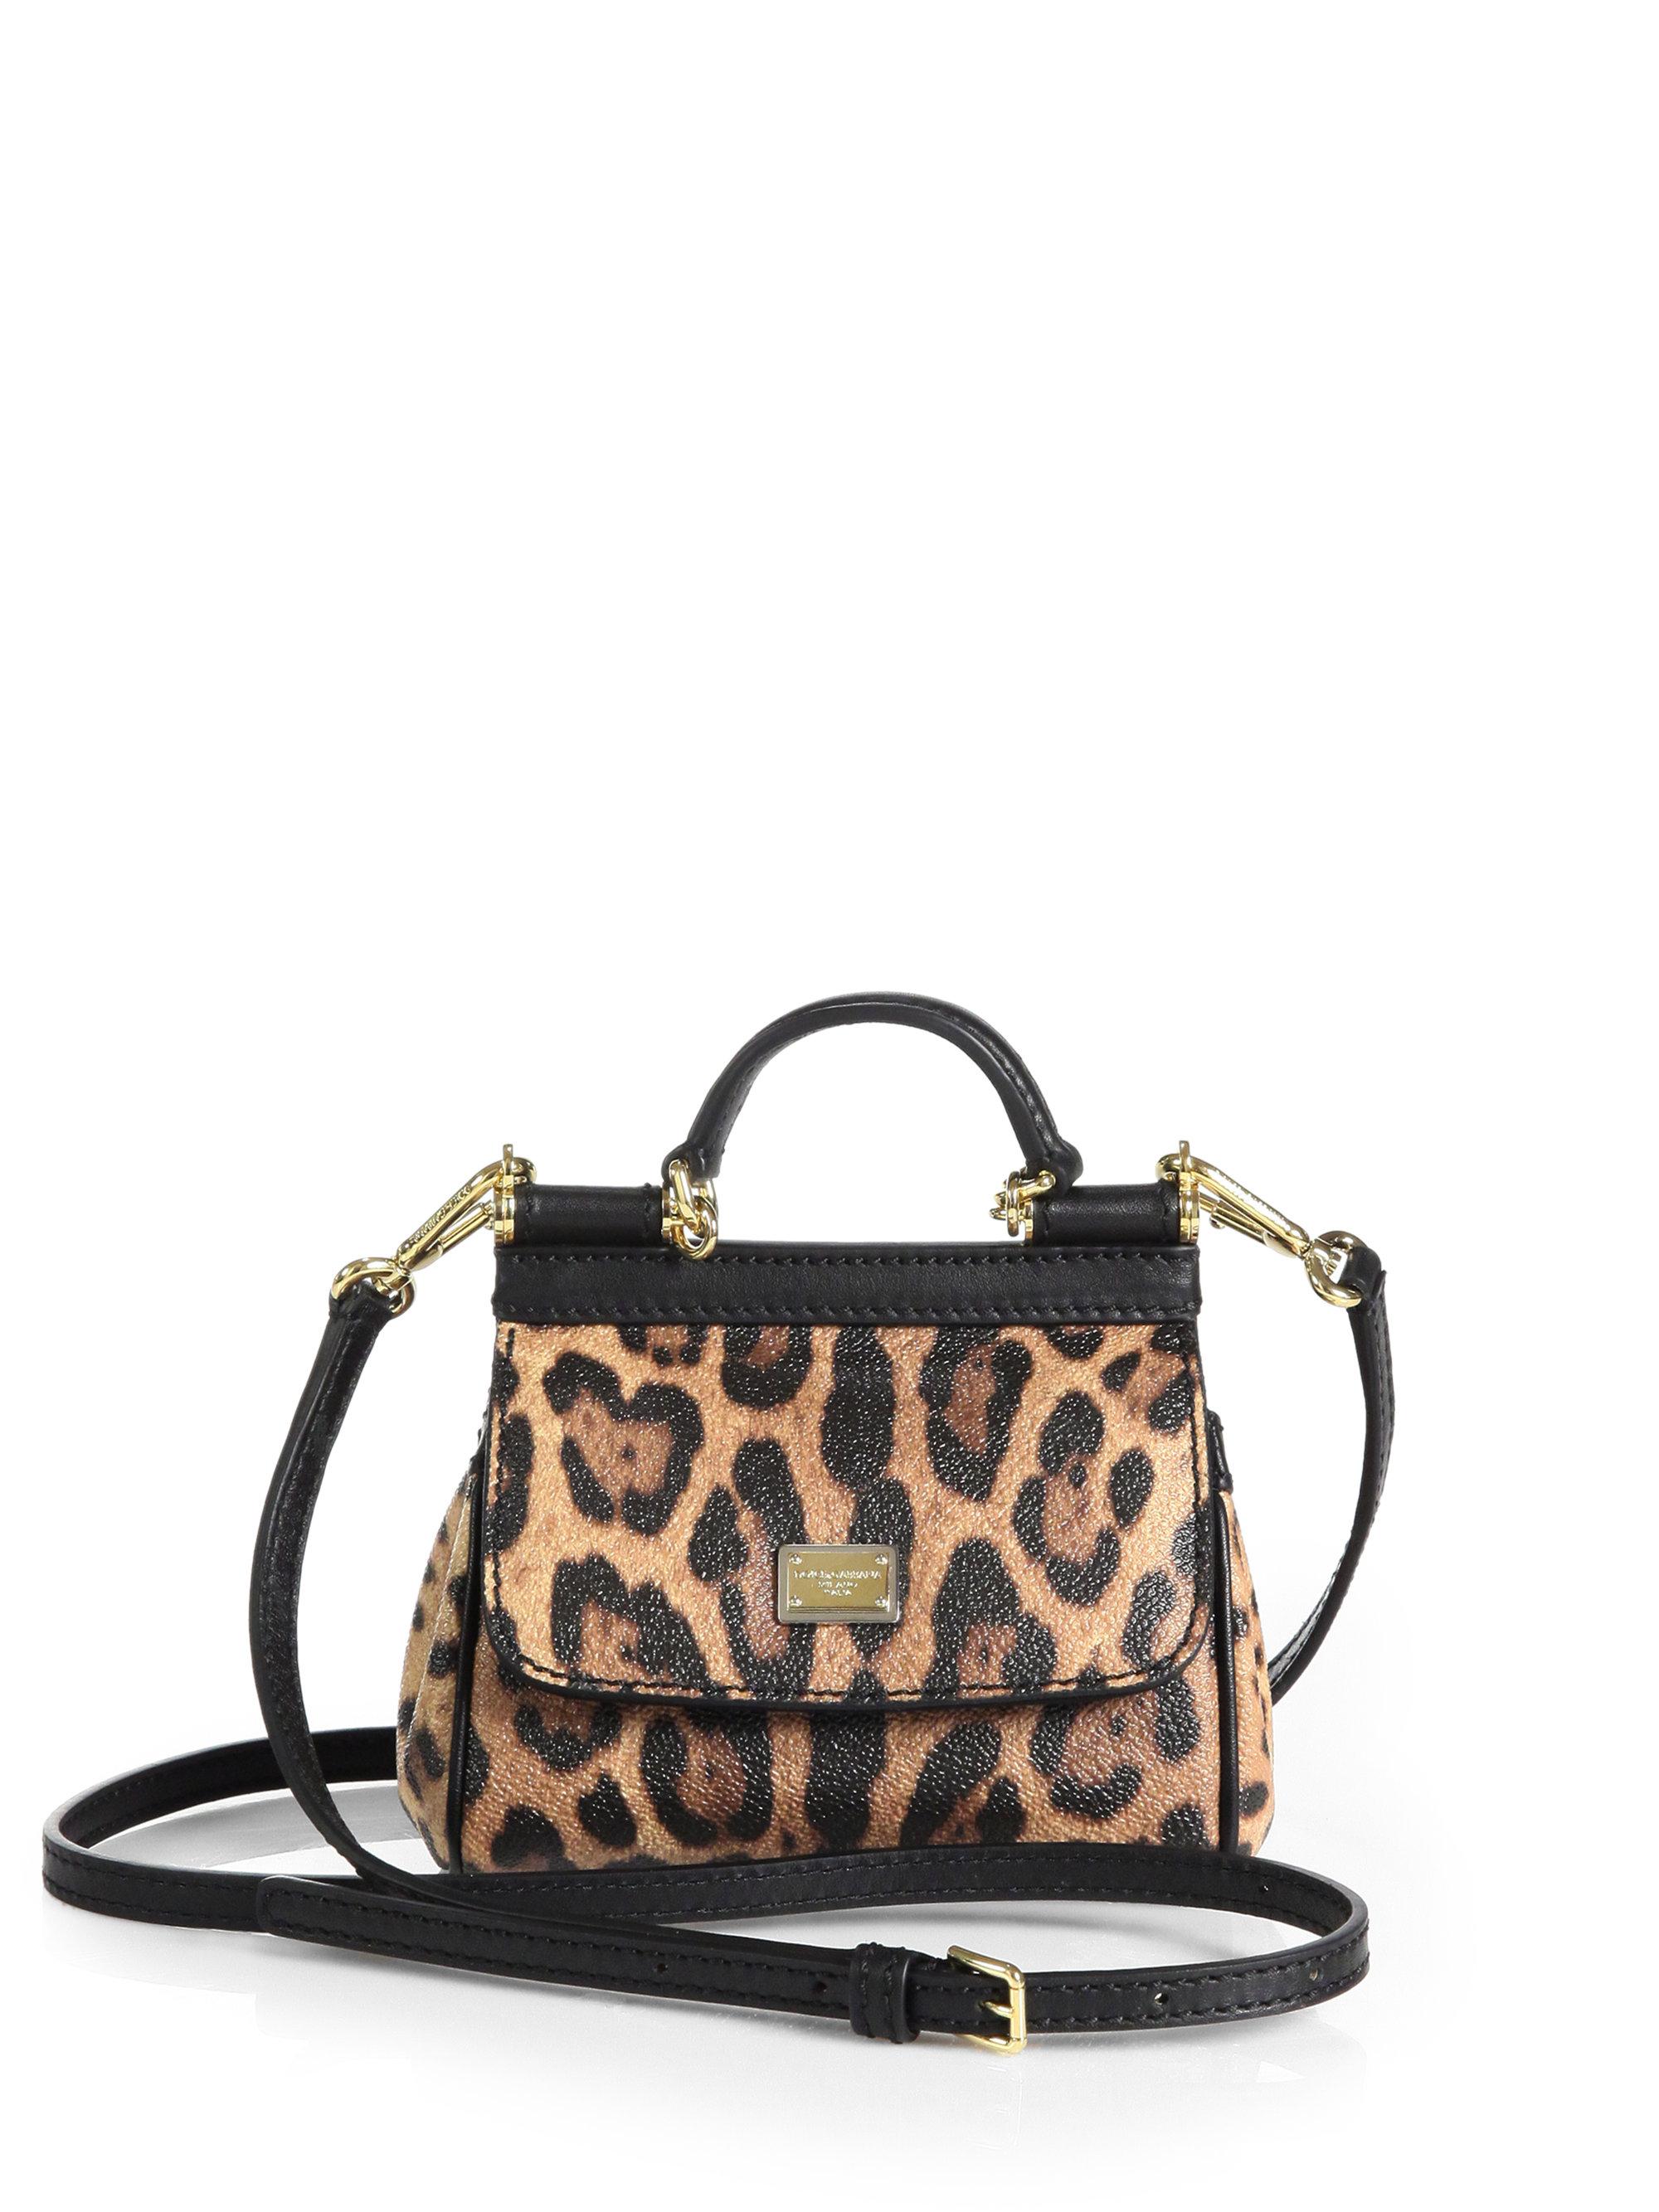 29f5d79f768 ... Source · Dolce And Gabbana Sicily Leopard Bag Best Image of Leopard  2018 Mini Hand Bag ... Dolce Gabbana Bags Reebonz United Arab Emirates ...